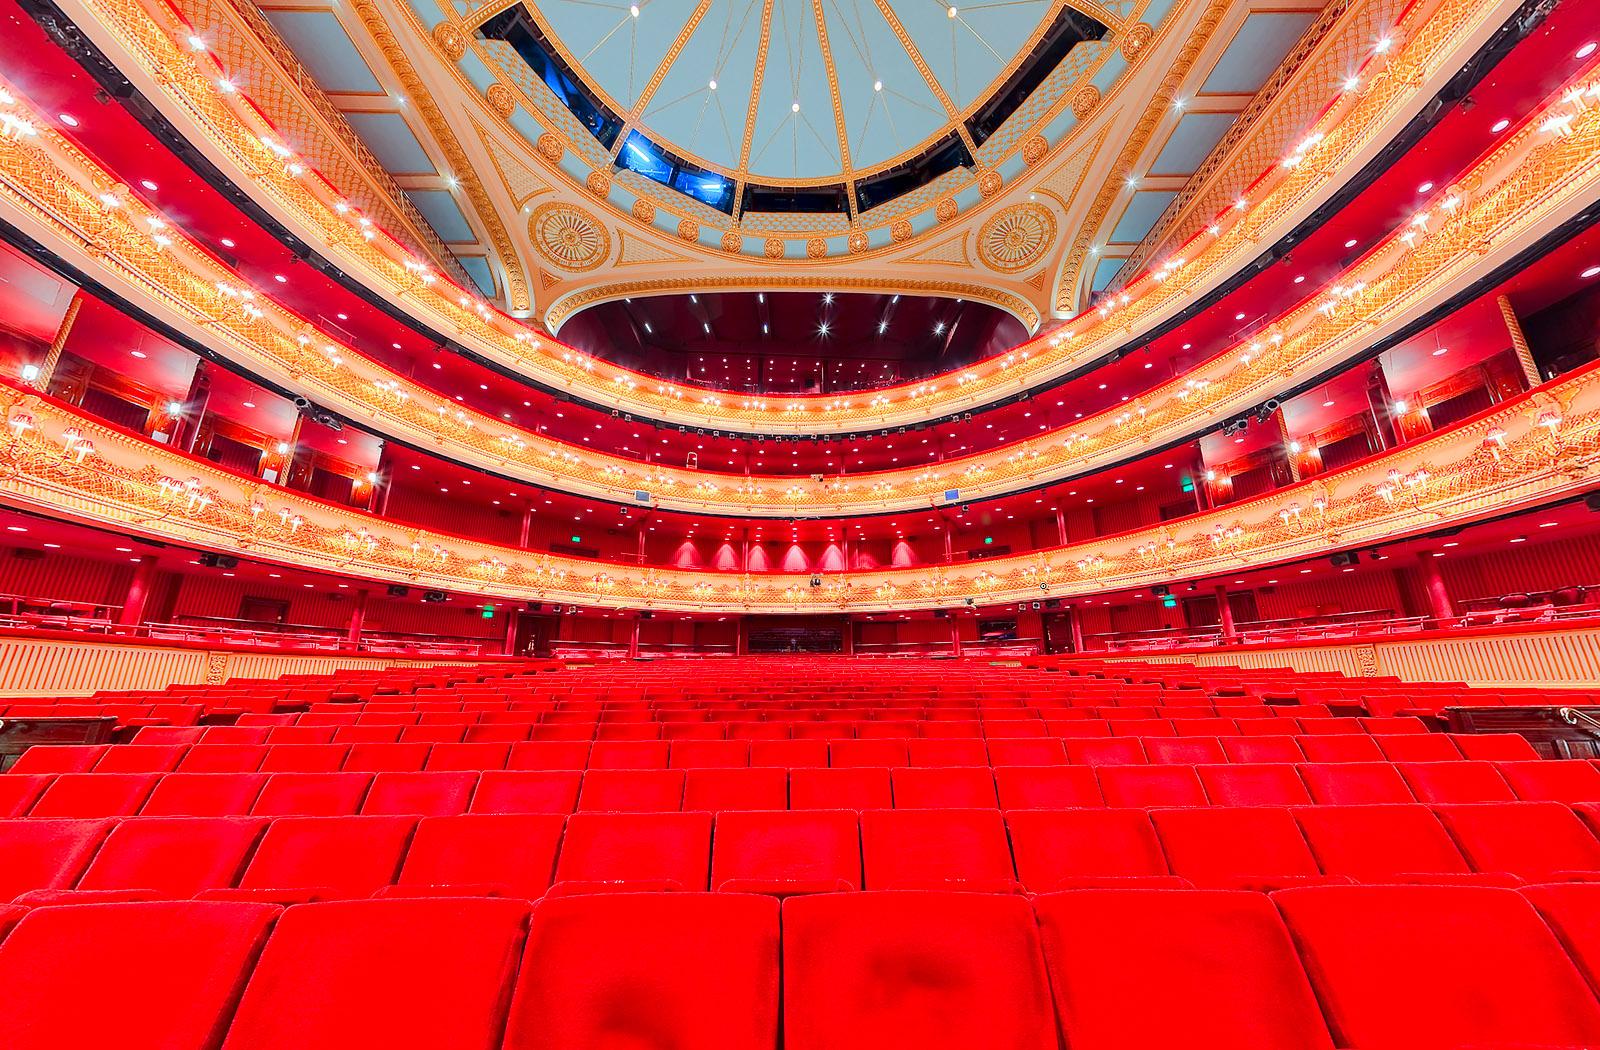 The Royal Opera House Virtual Tours 360 Theatre Virtual